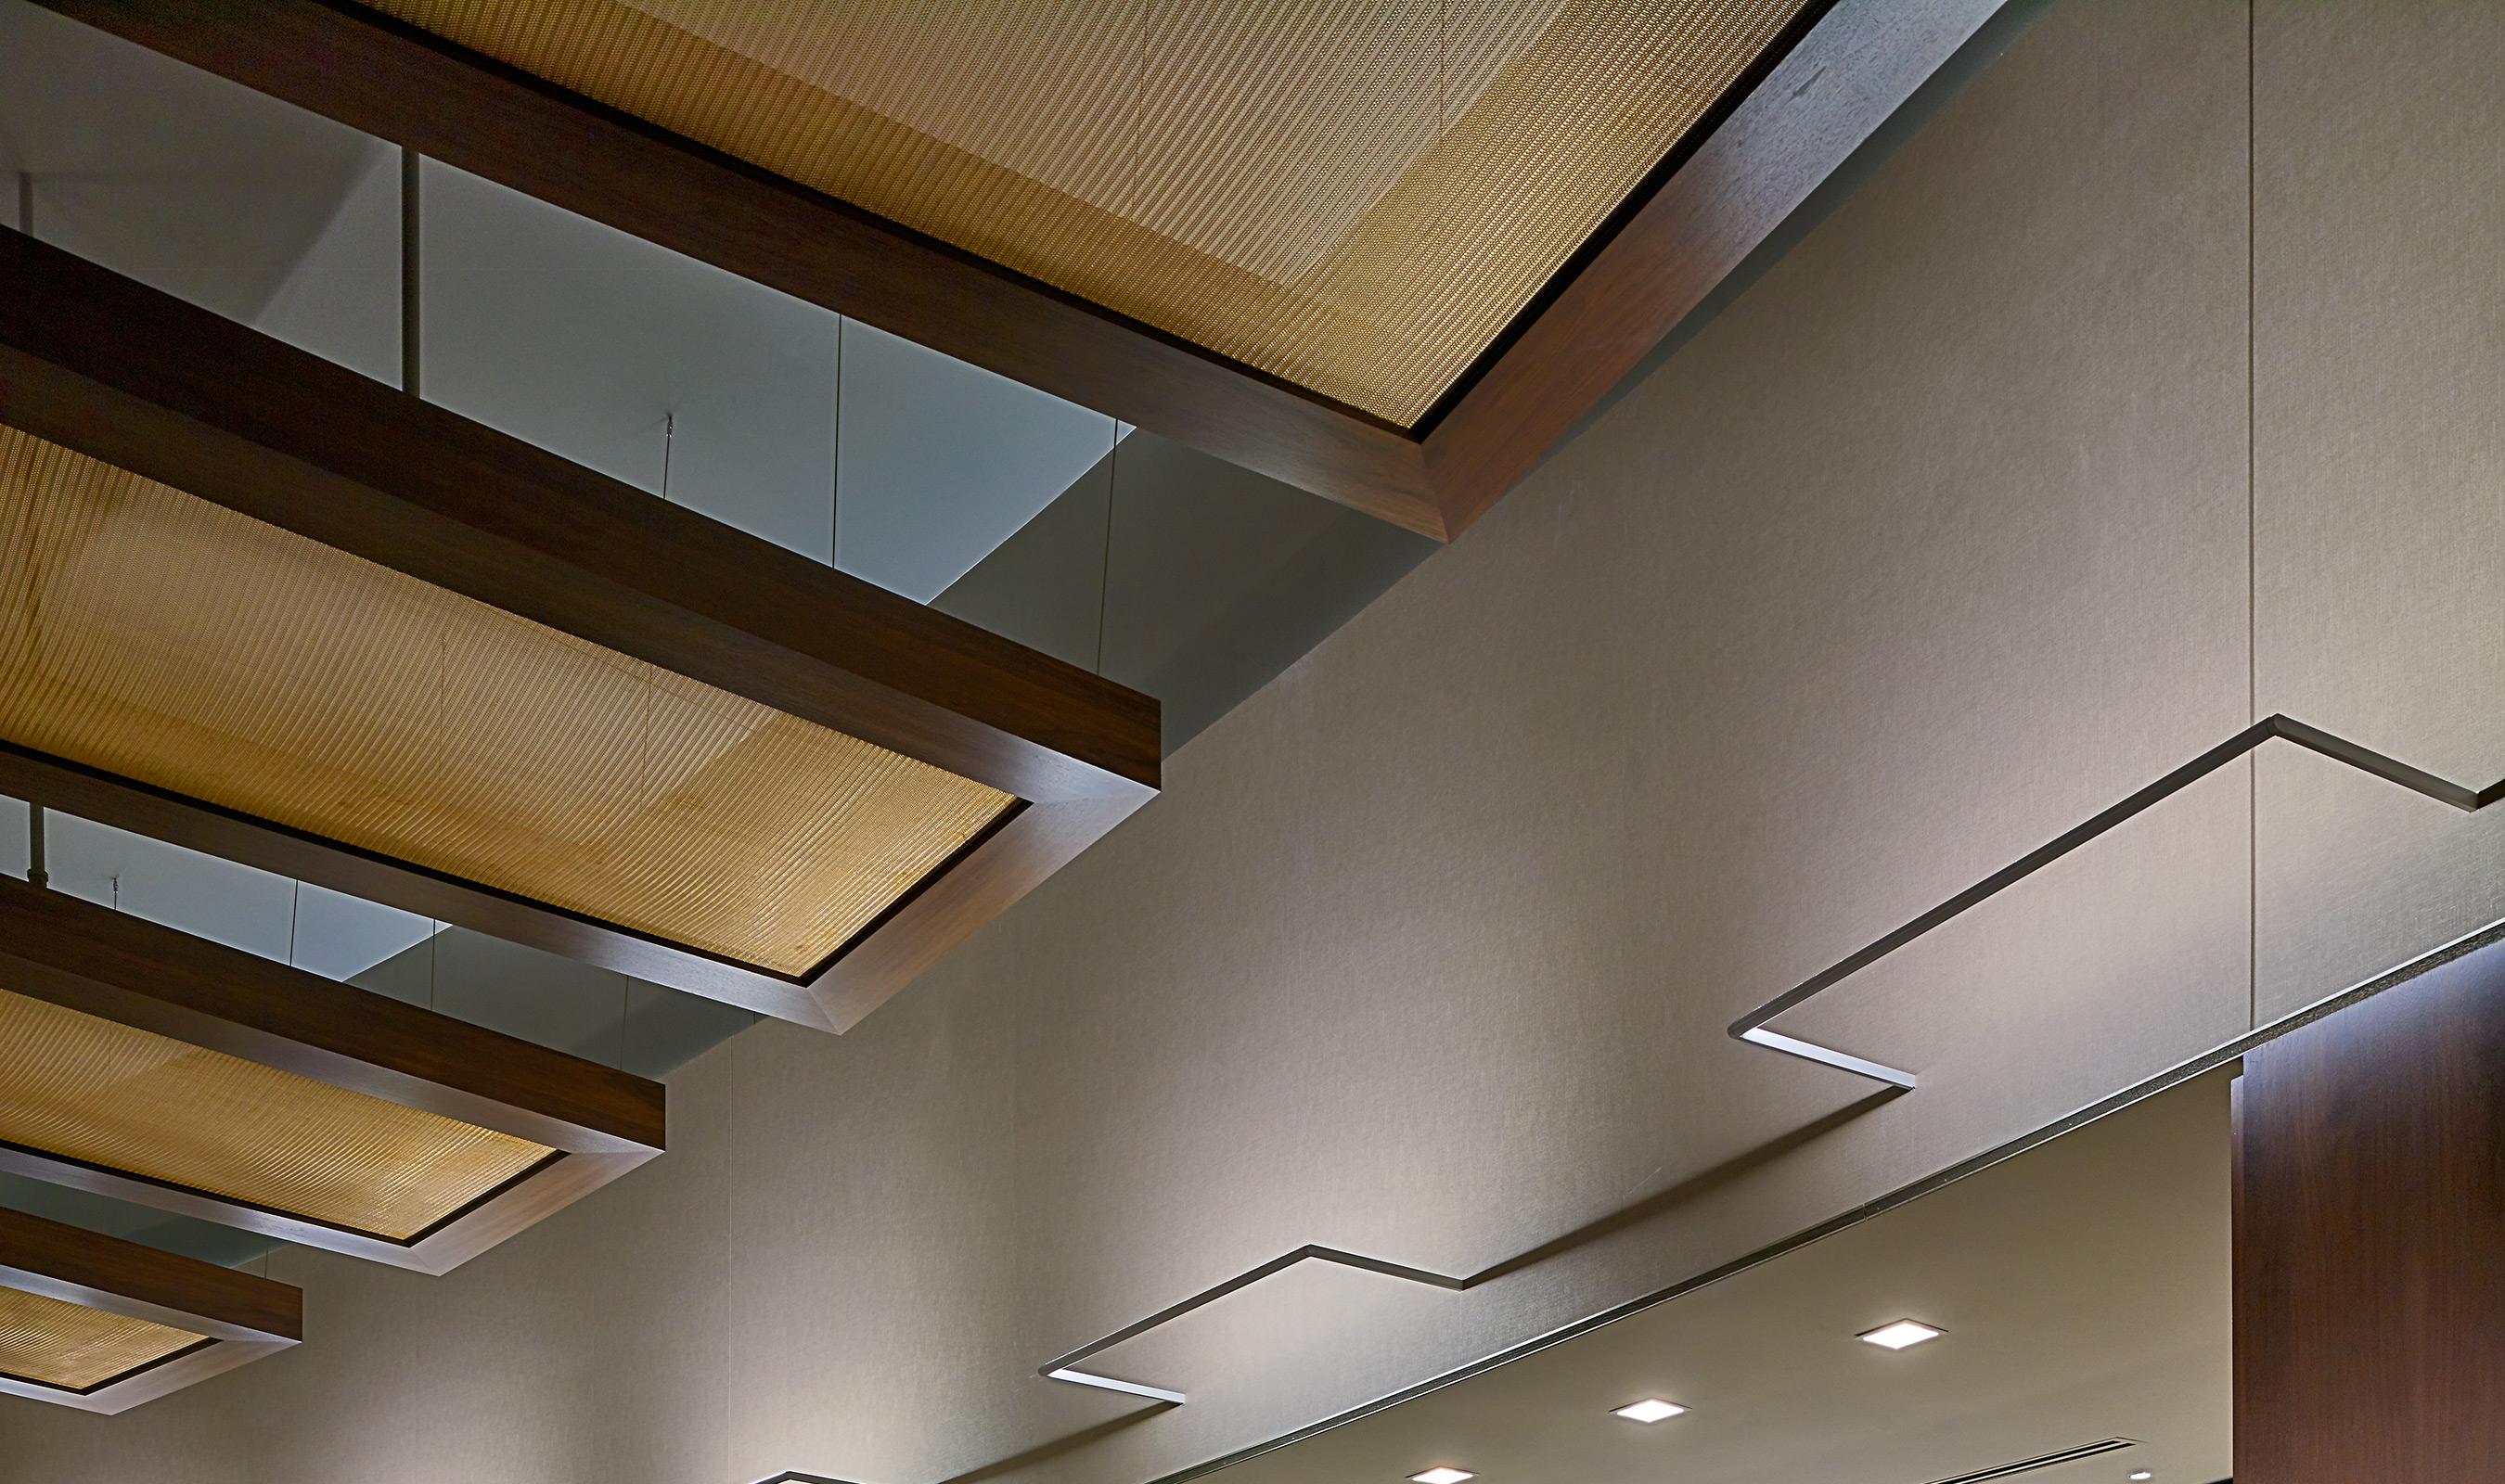 Bronze ceiling clouds framed with dark wood surround